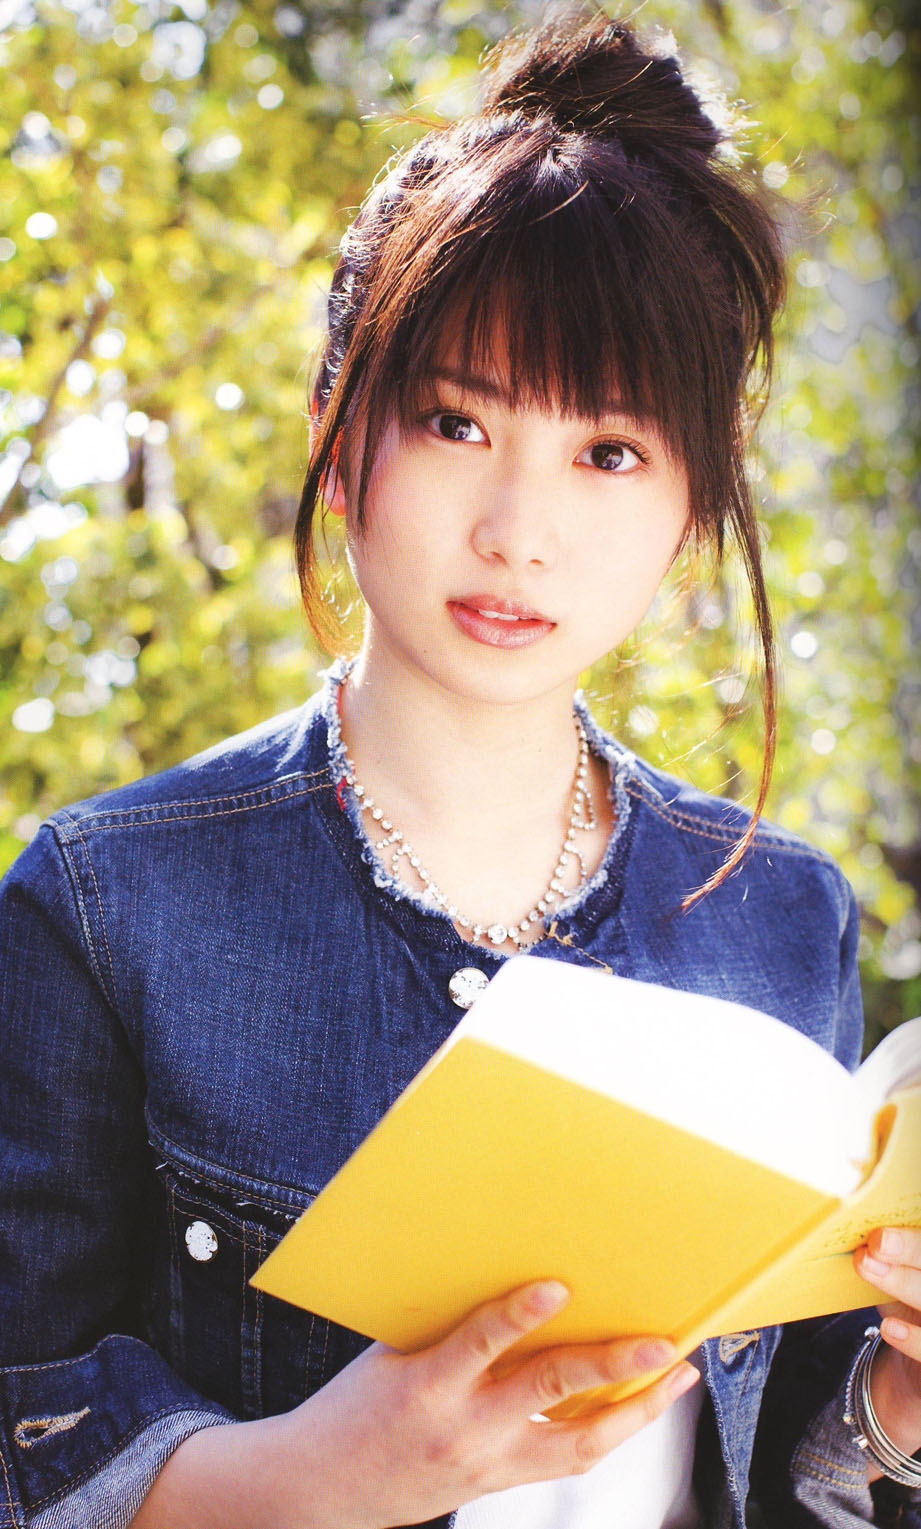 Mirai Shida livejournal